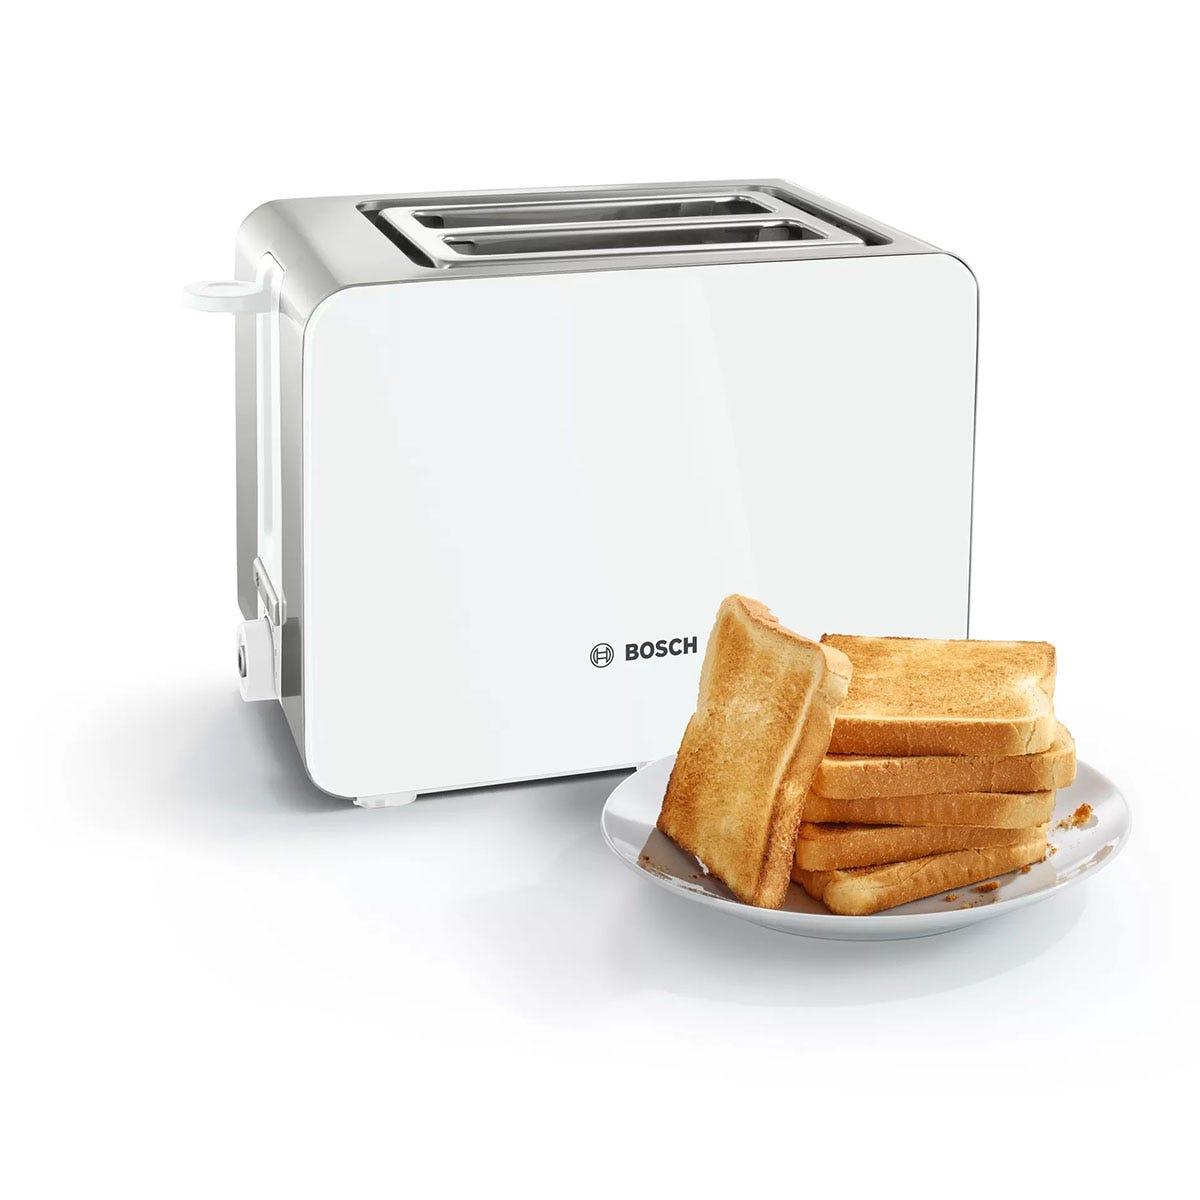 Bosch TAT7201GB Sky Toaster - White & Silver